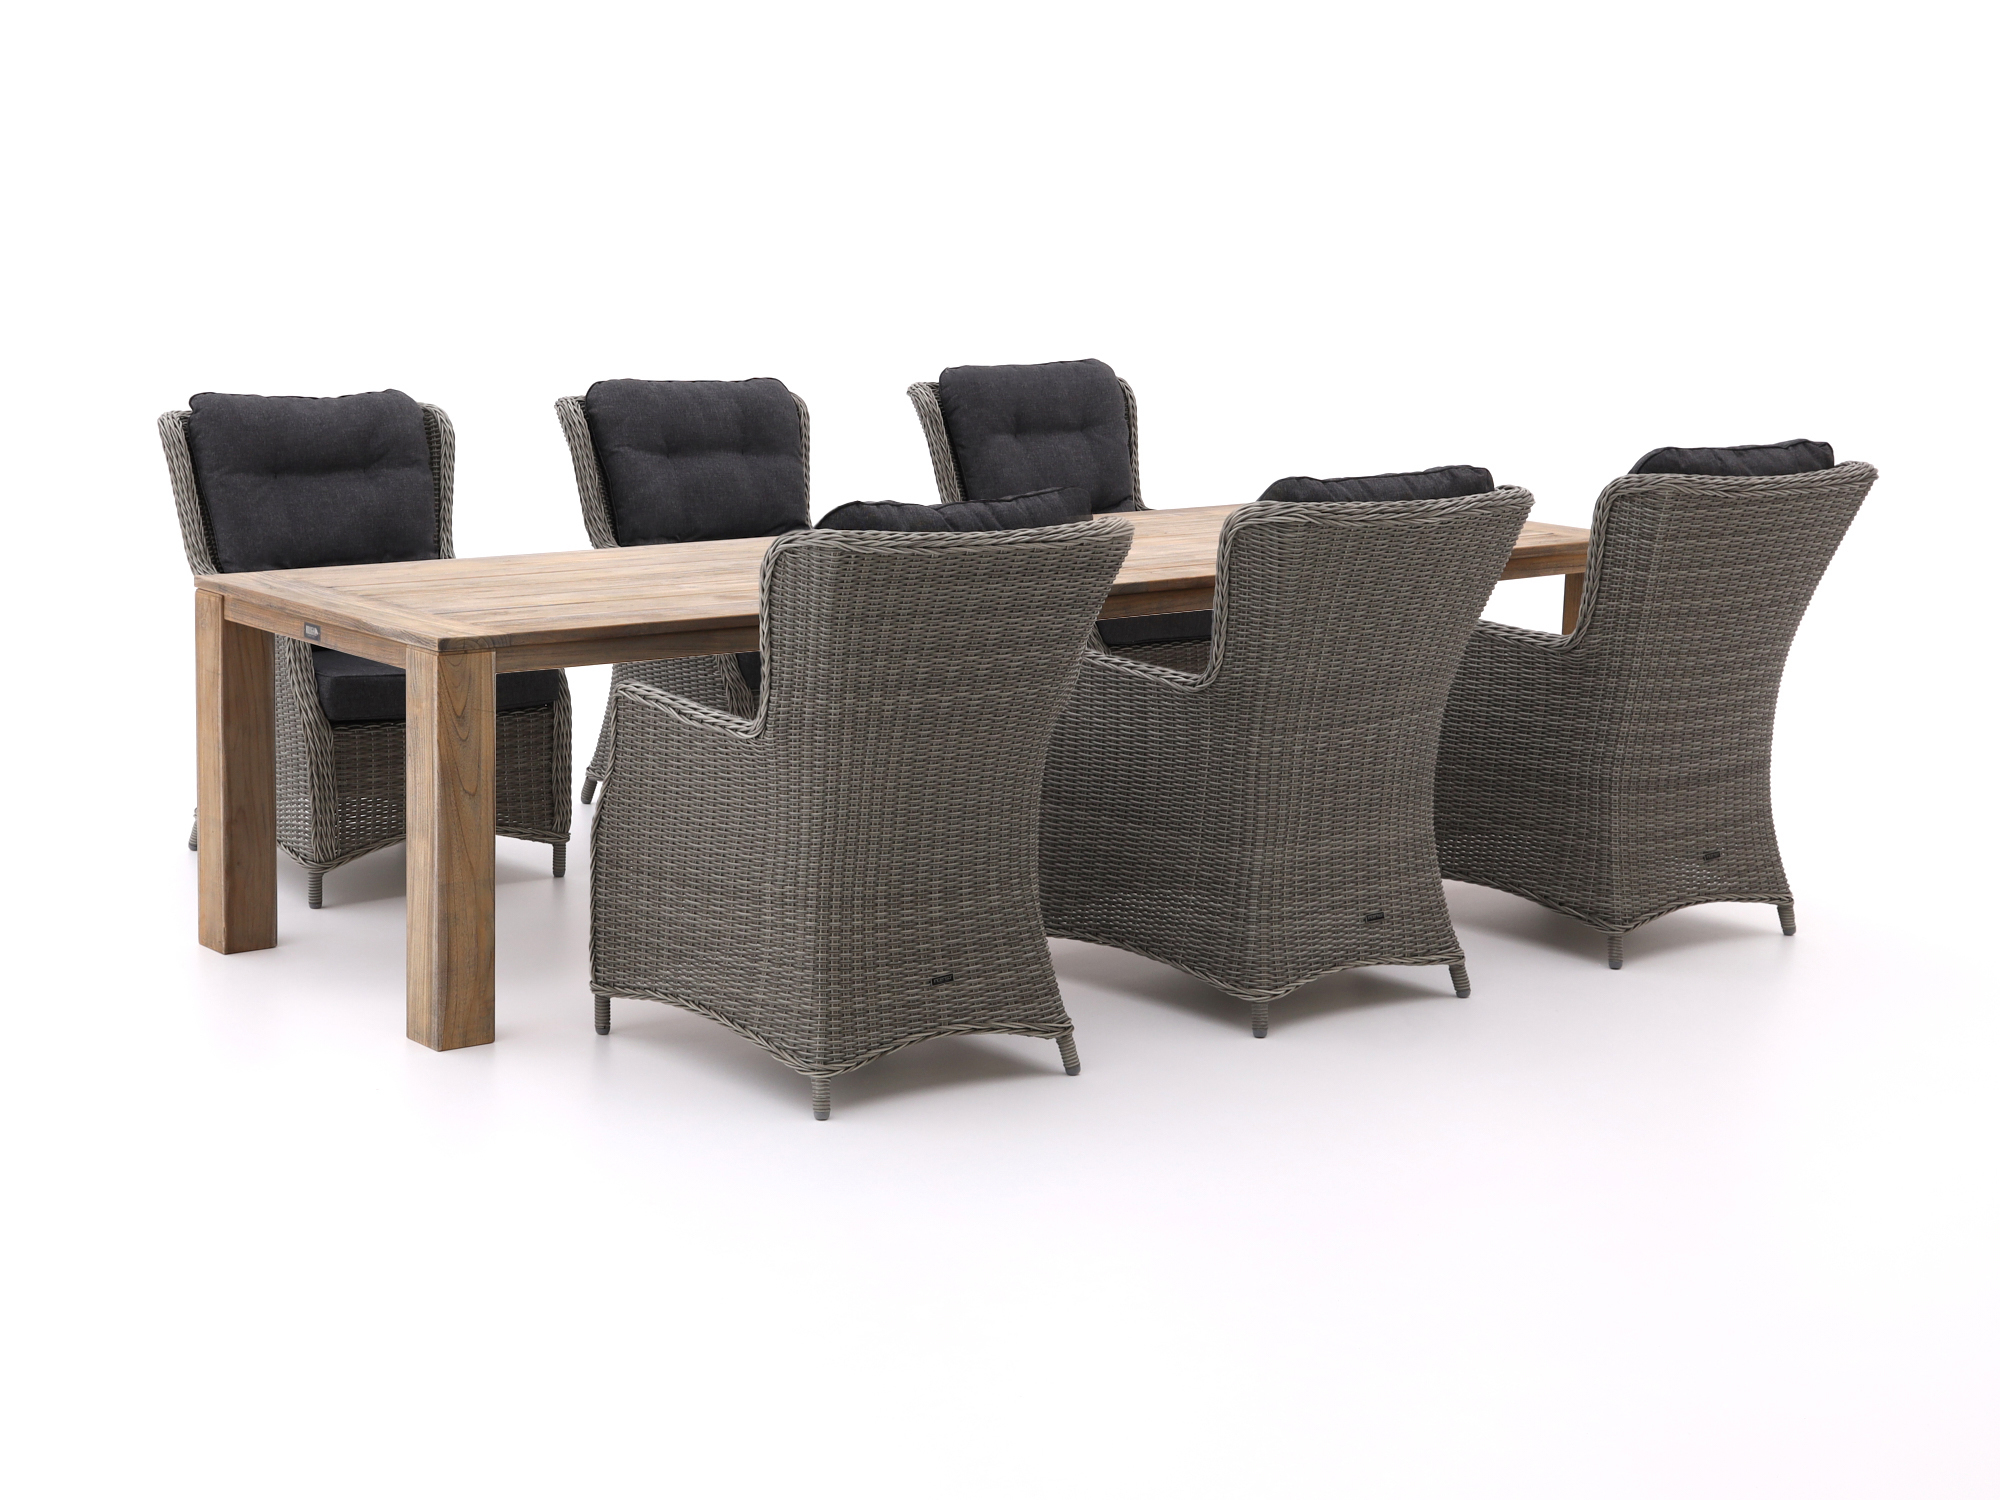 Intenso Milano/ROUGH-X 320cm lounge-dining tuinset 7-delig - Laagste prijsgarantie!